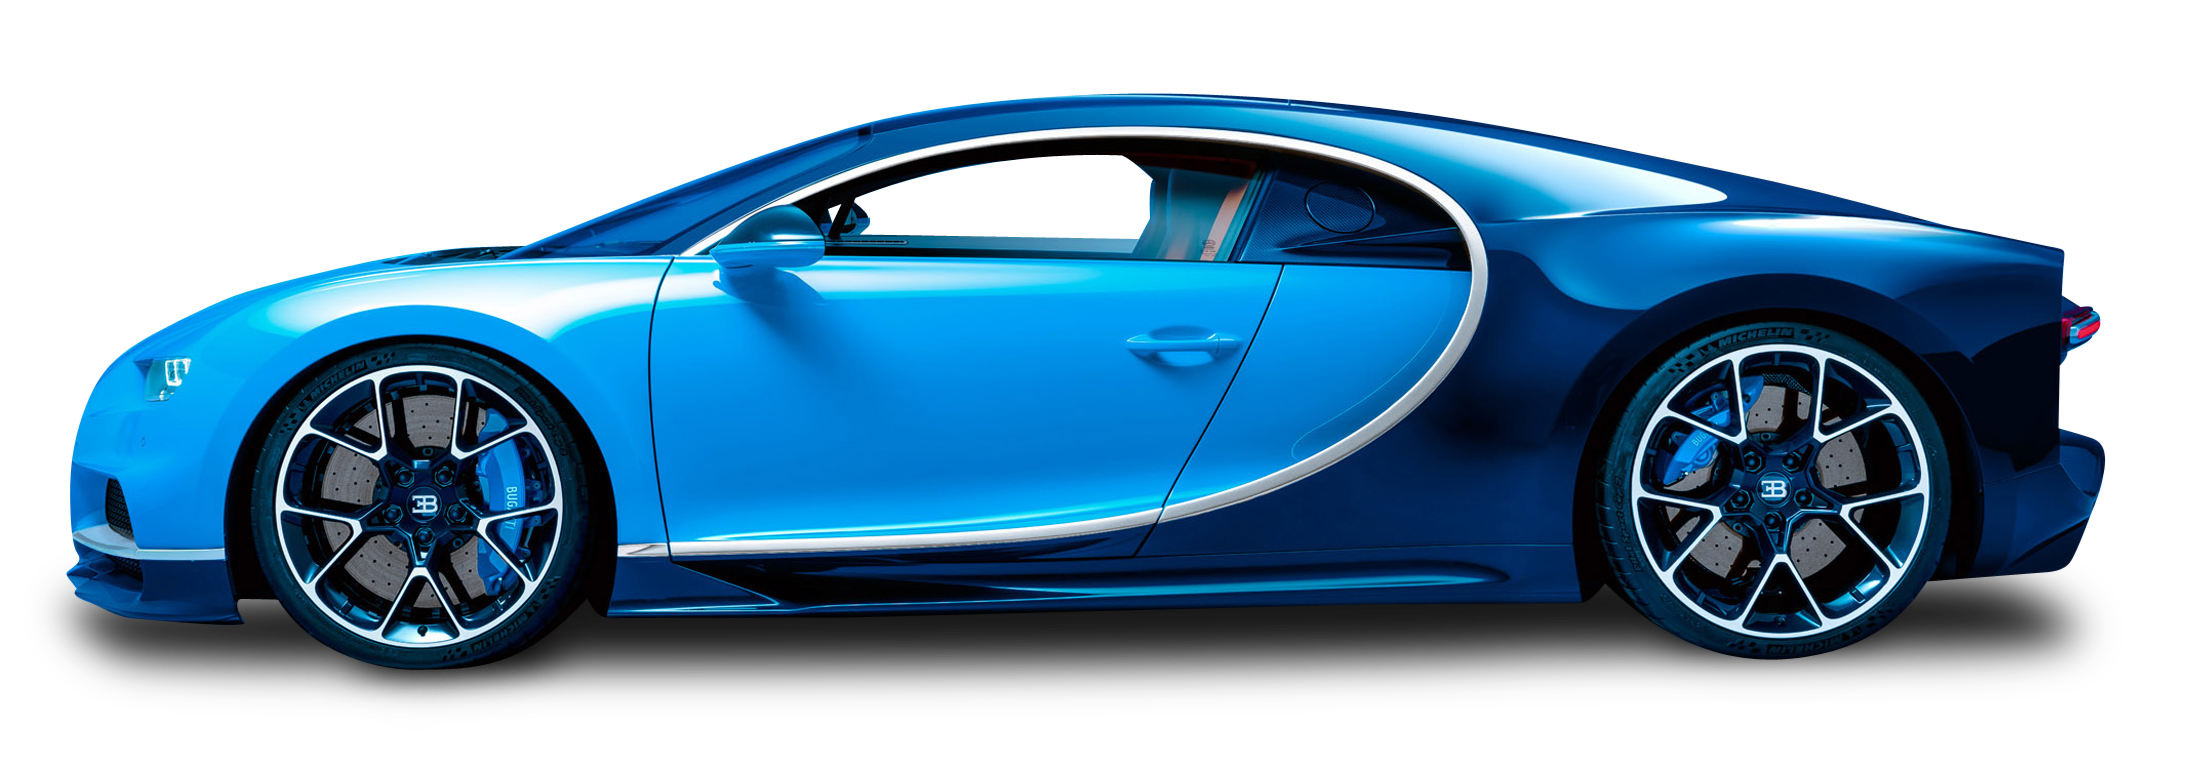 Blue Bugatti Chiron Car Png Image Bugatti Cars Car Images Car